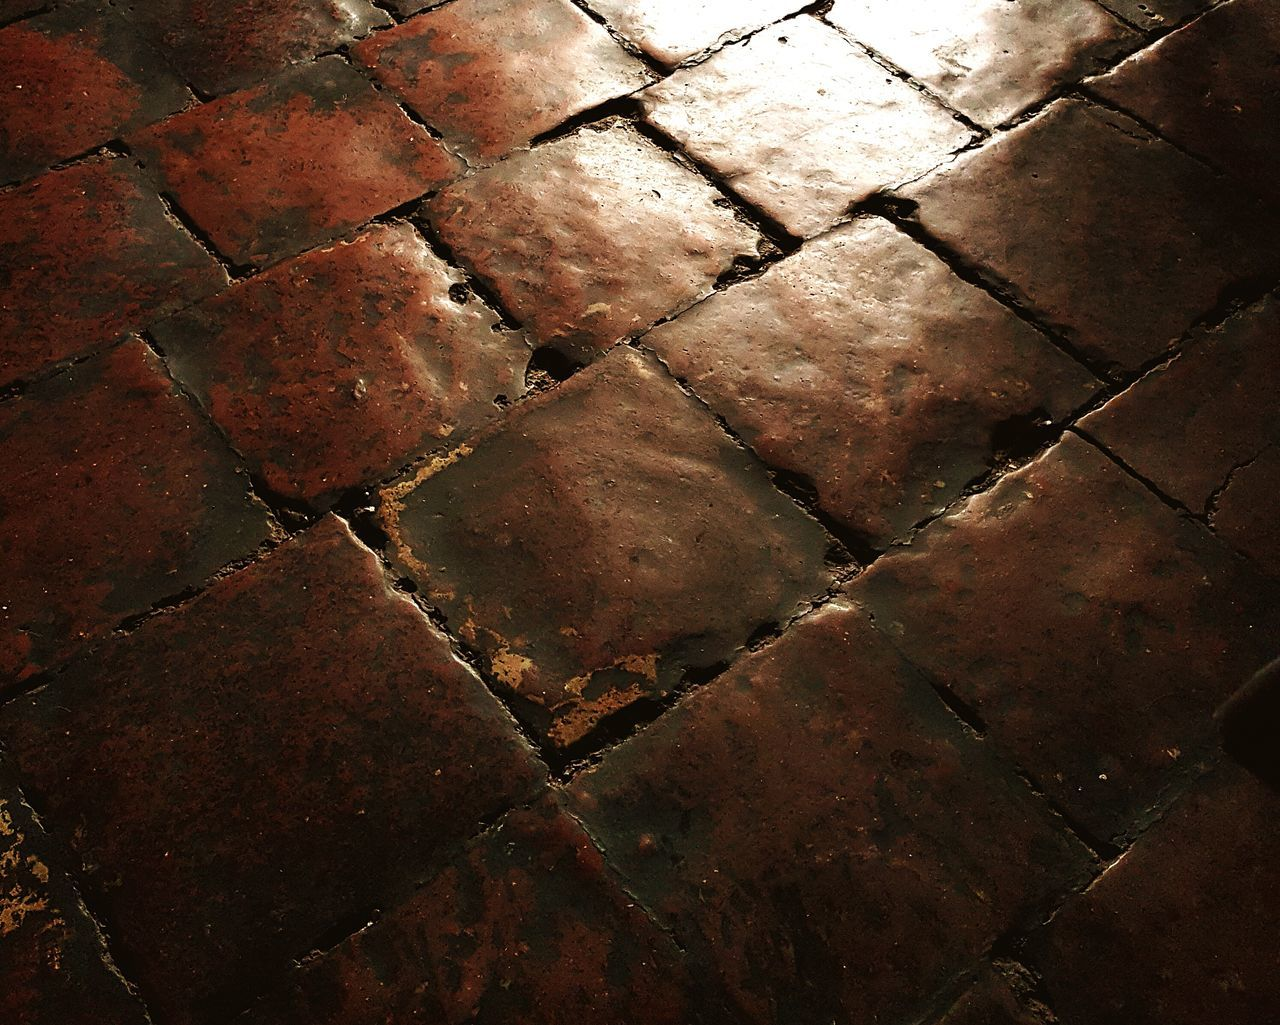 No People Close-up Floor Flooring Pattern Old Restaurant Cofeeshop Angelo Colonial